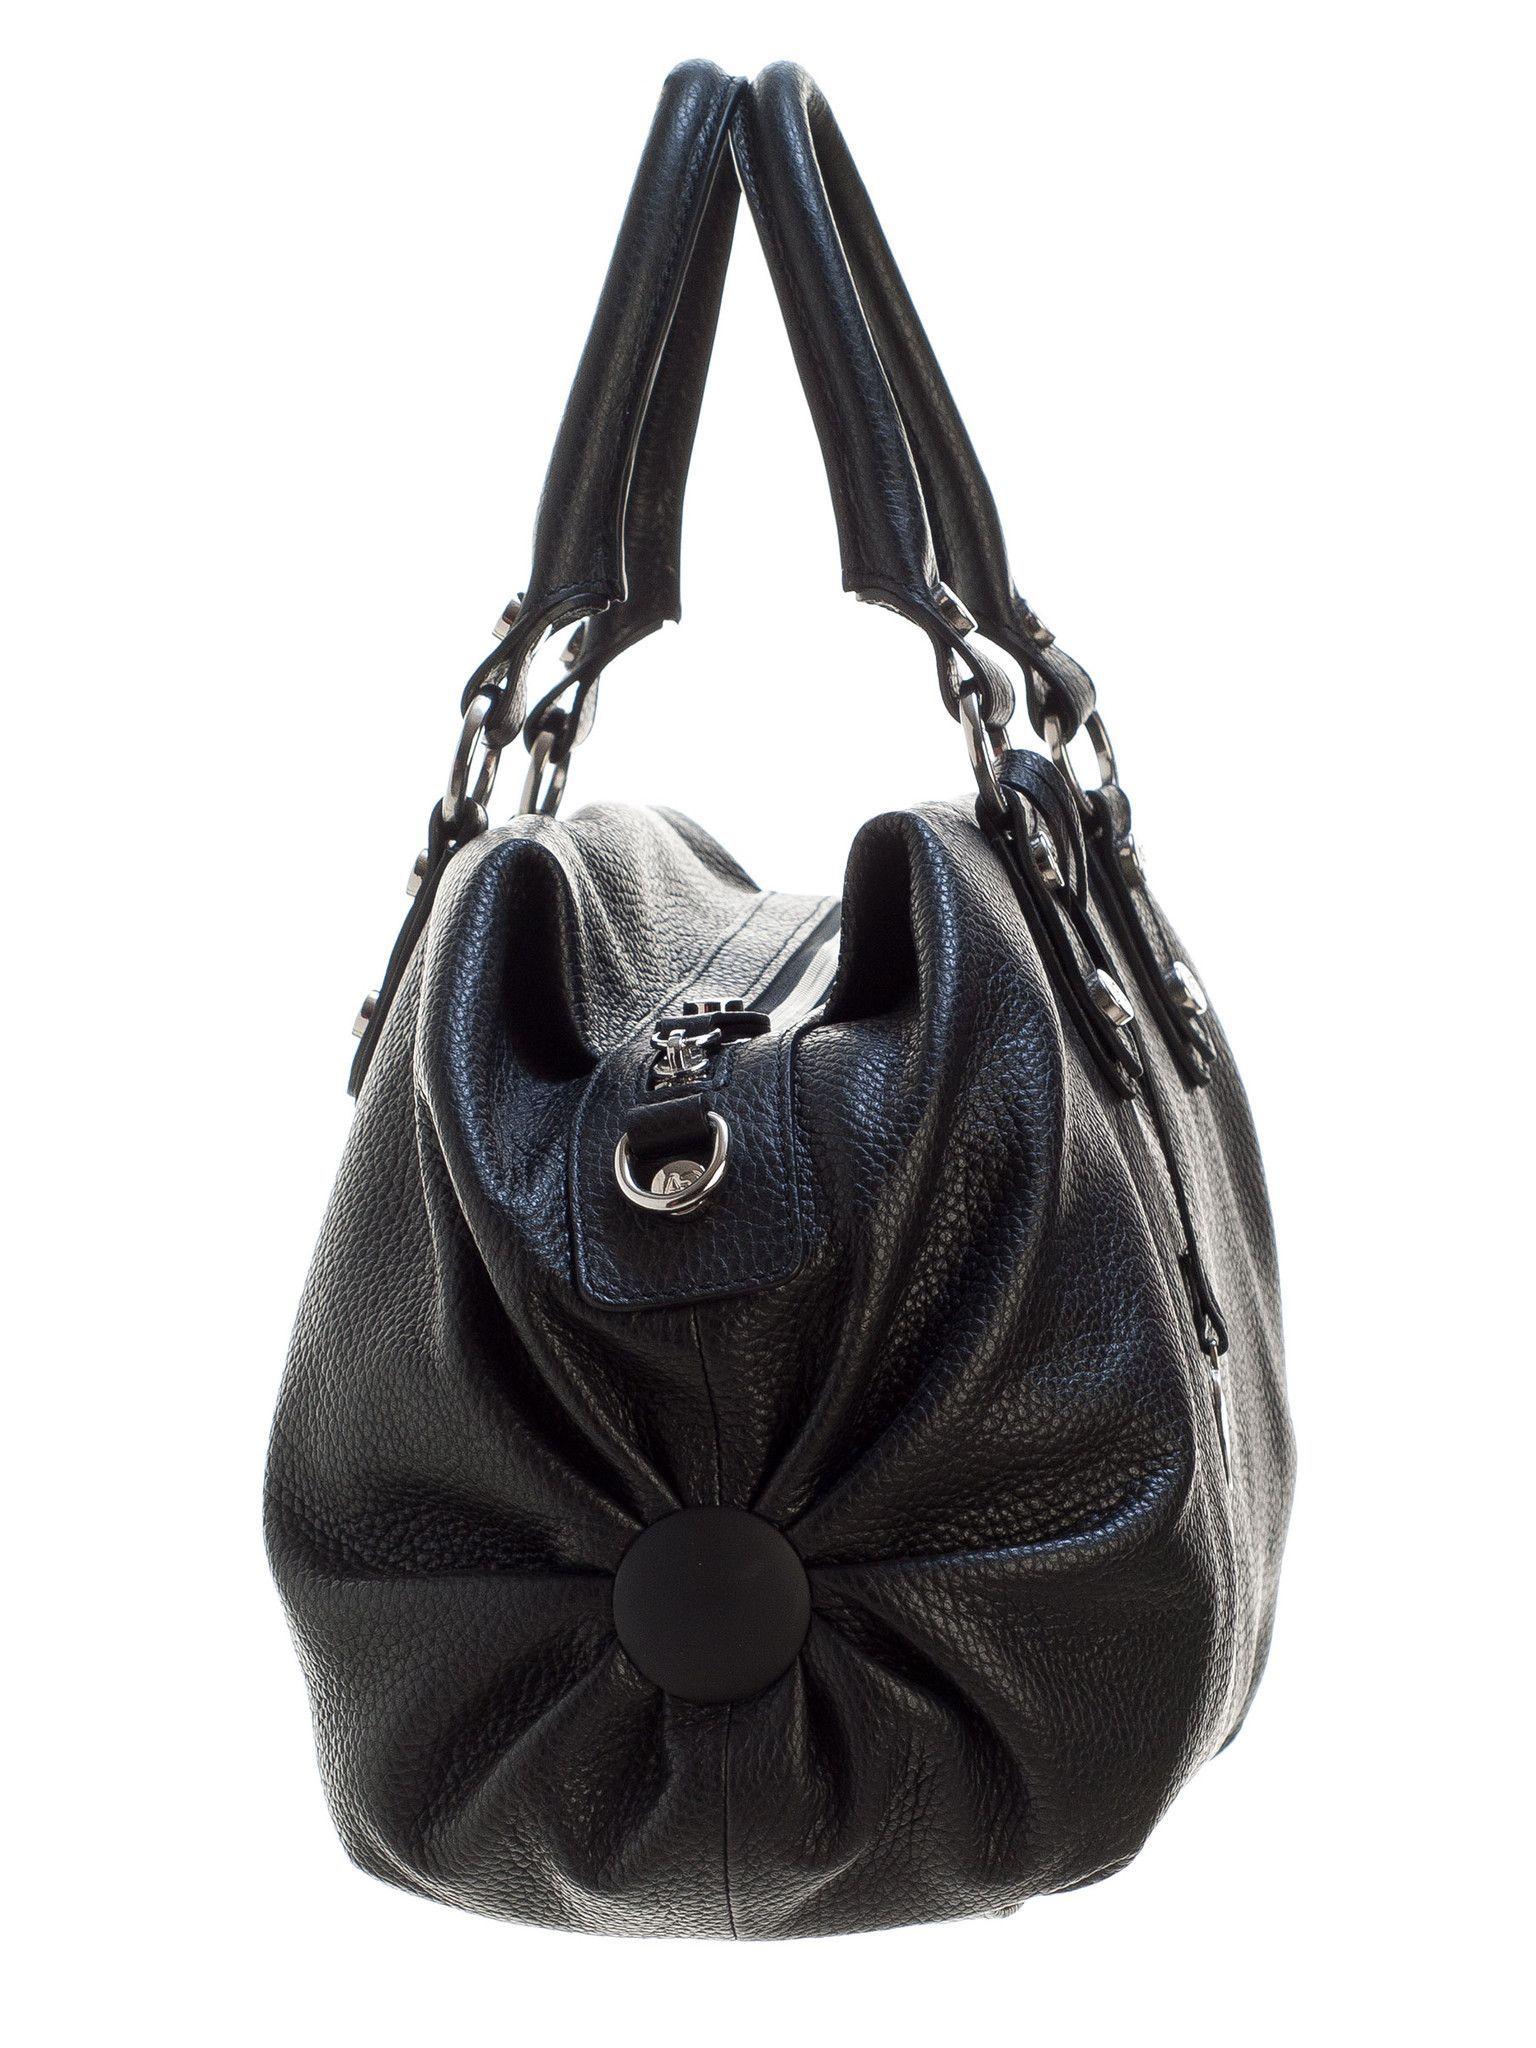 1176a16f8ec6 Condotti-Large Leather Bowler Handbag-Black